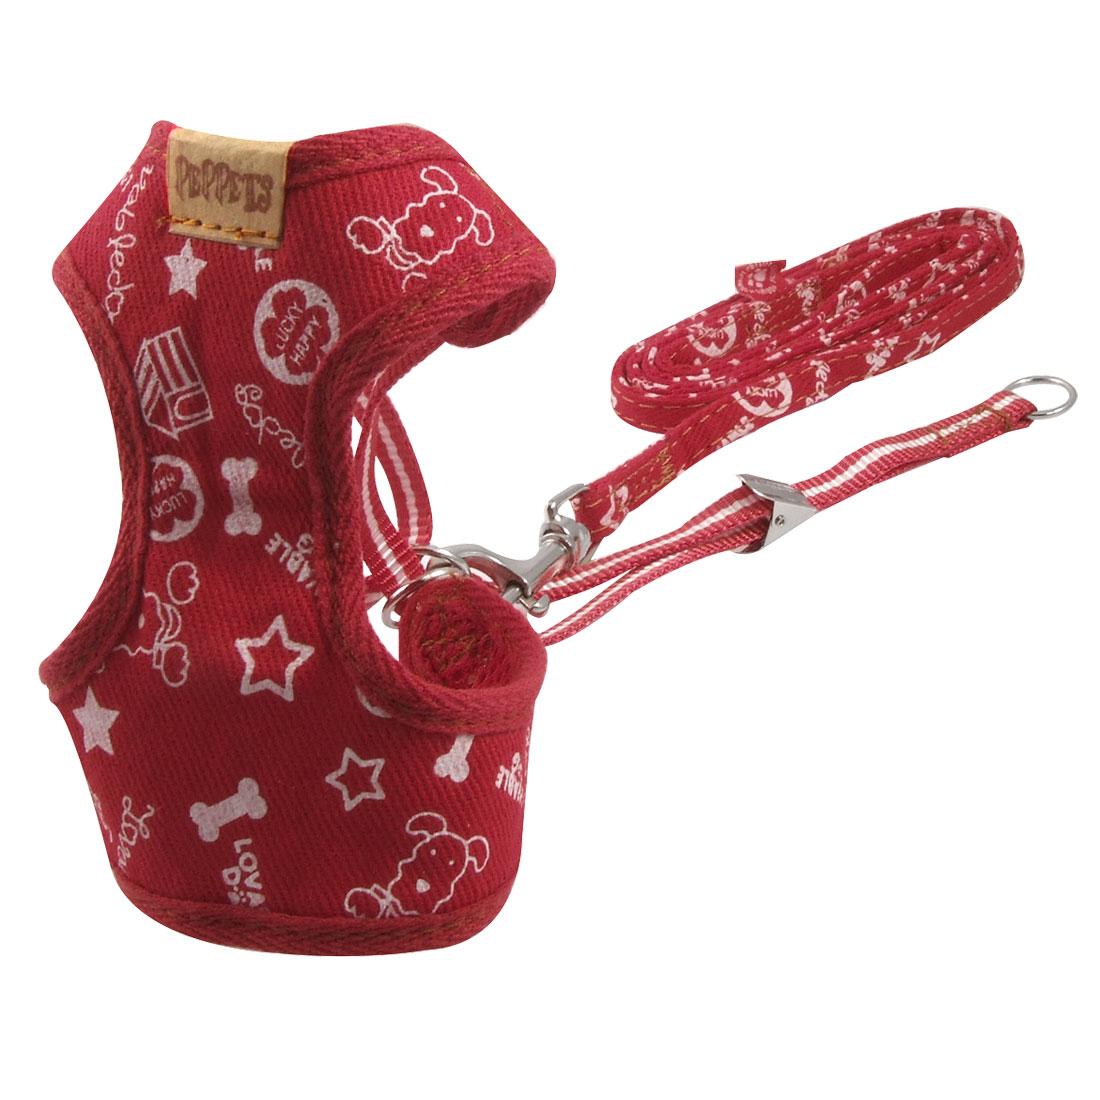 Bone Stars Letters Printed Red Nylon Sponge Dog Cat Pet Harness Vest Size 2 w Leash